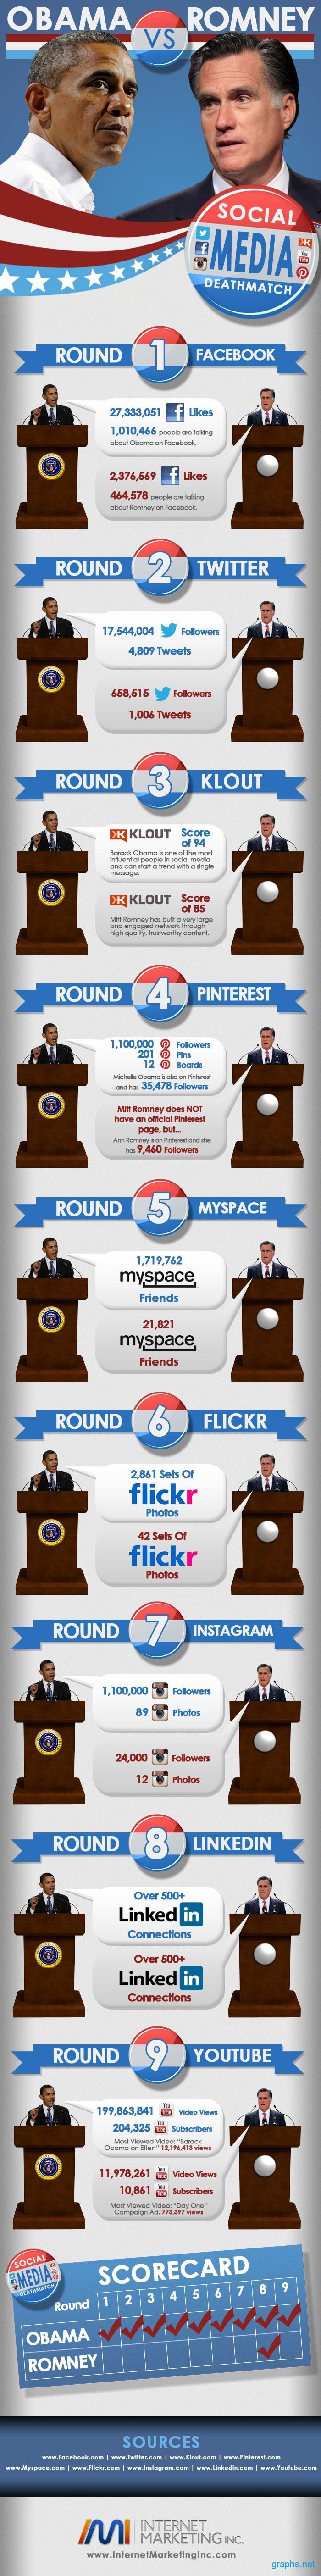 Obama vs. Romney Social Media Deathmatch